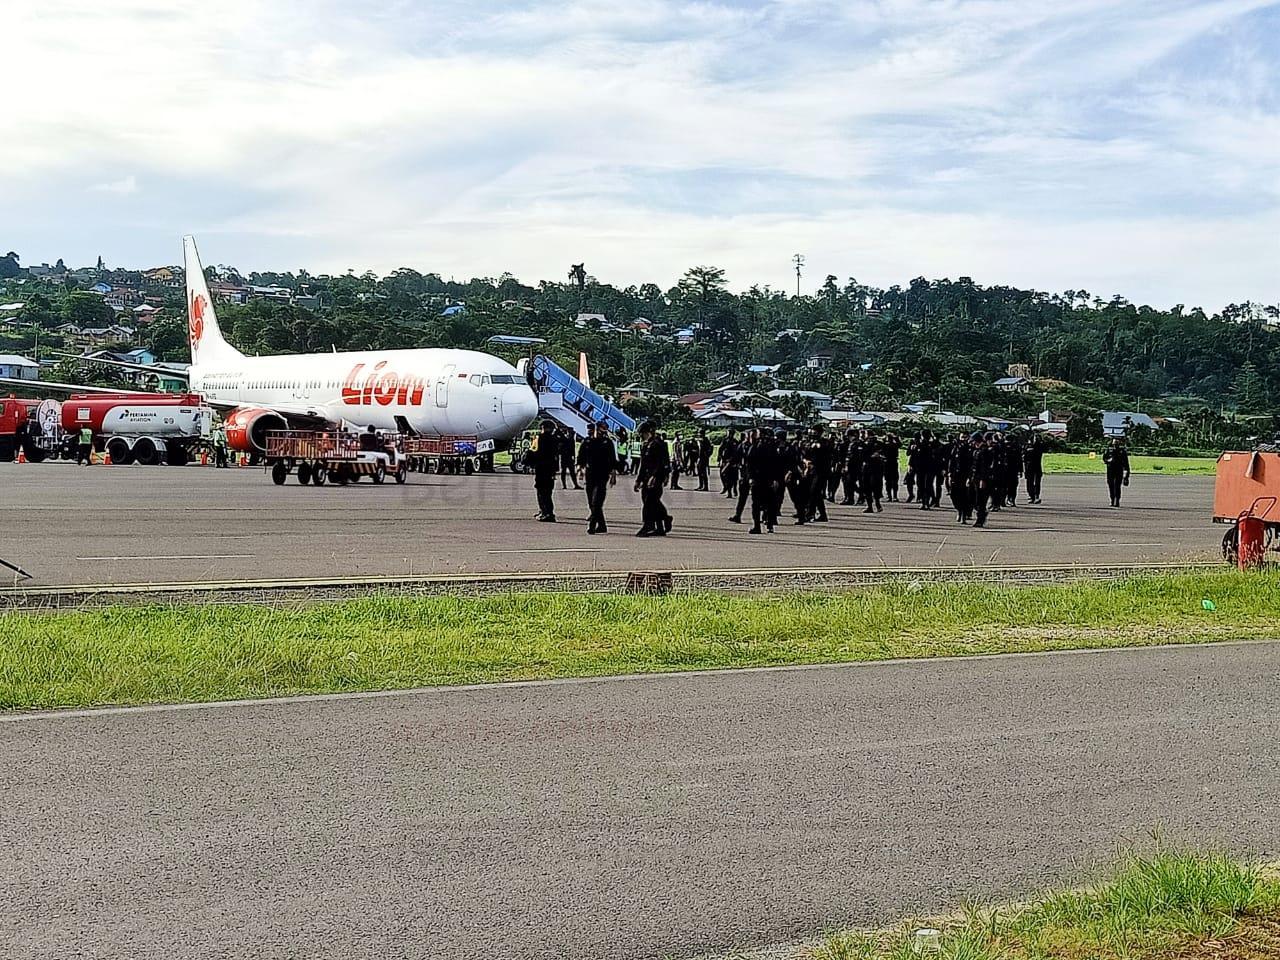 200 Personel Brimob Dari Kelapa Dua Jakarta Tiba di Papua Barat 26 IMG 20201206 WA0026